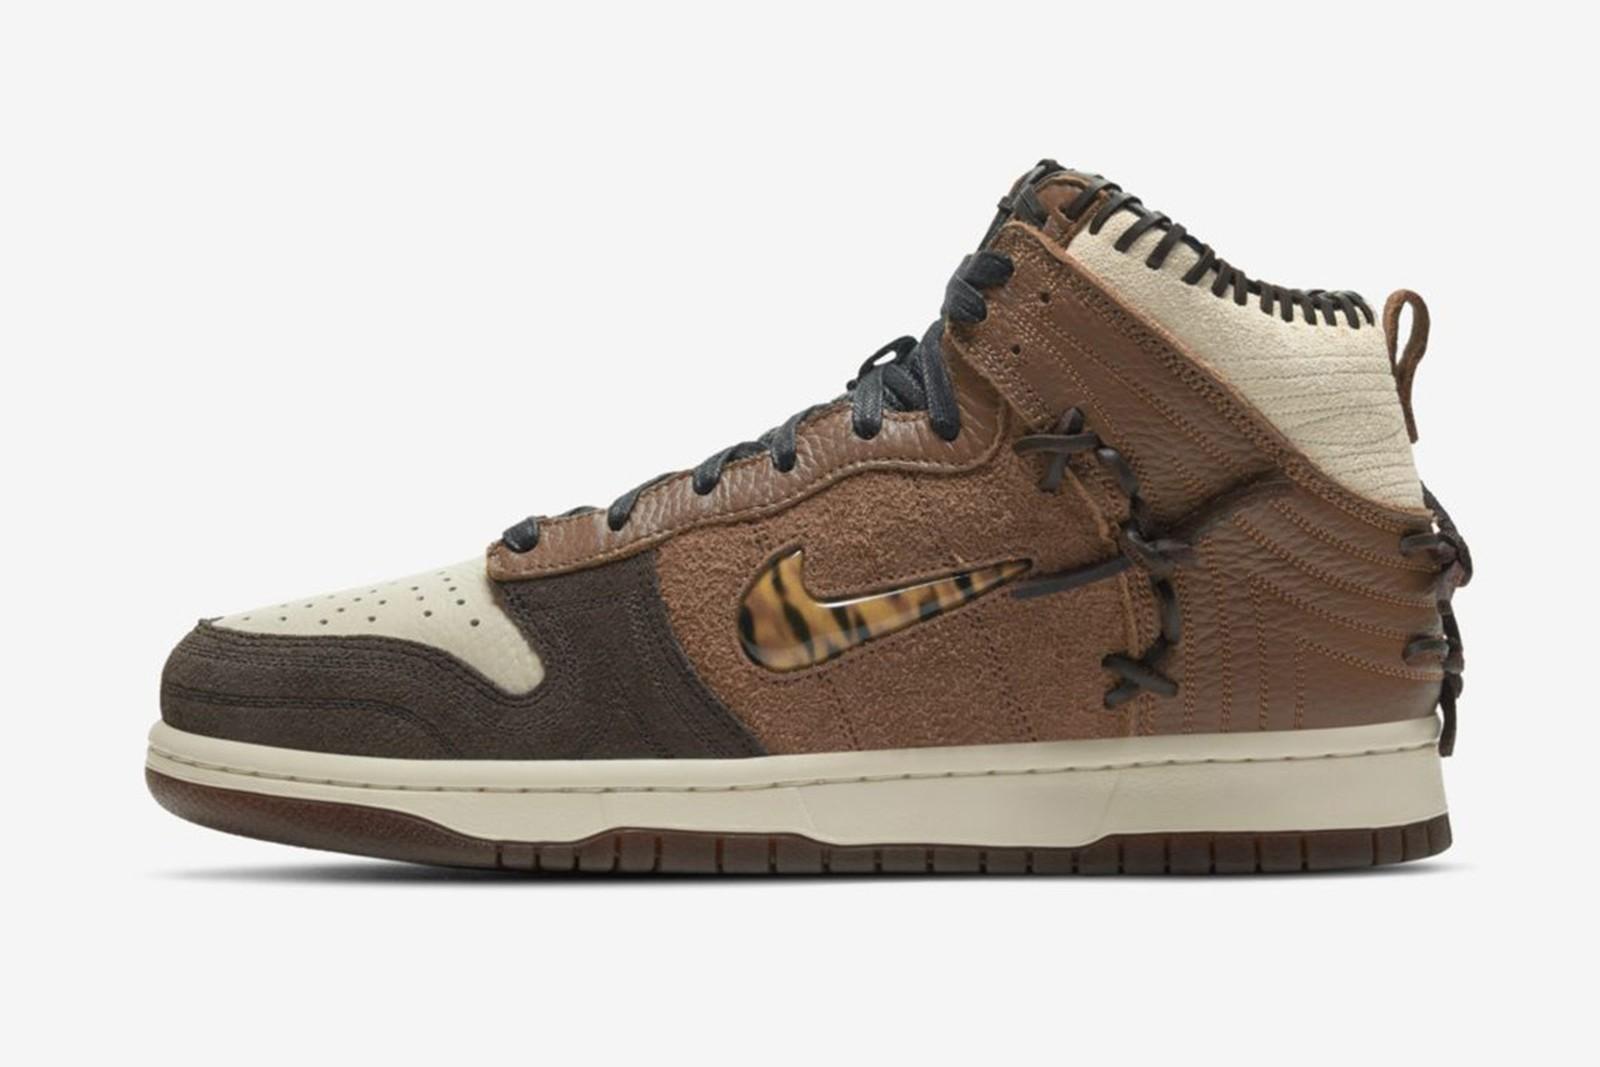 Bodega x Nike Dunk High Brown